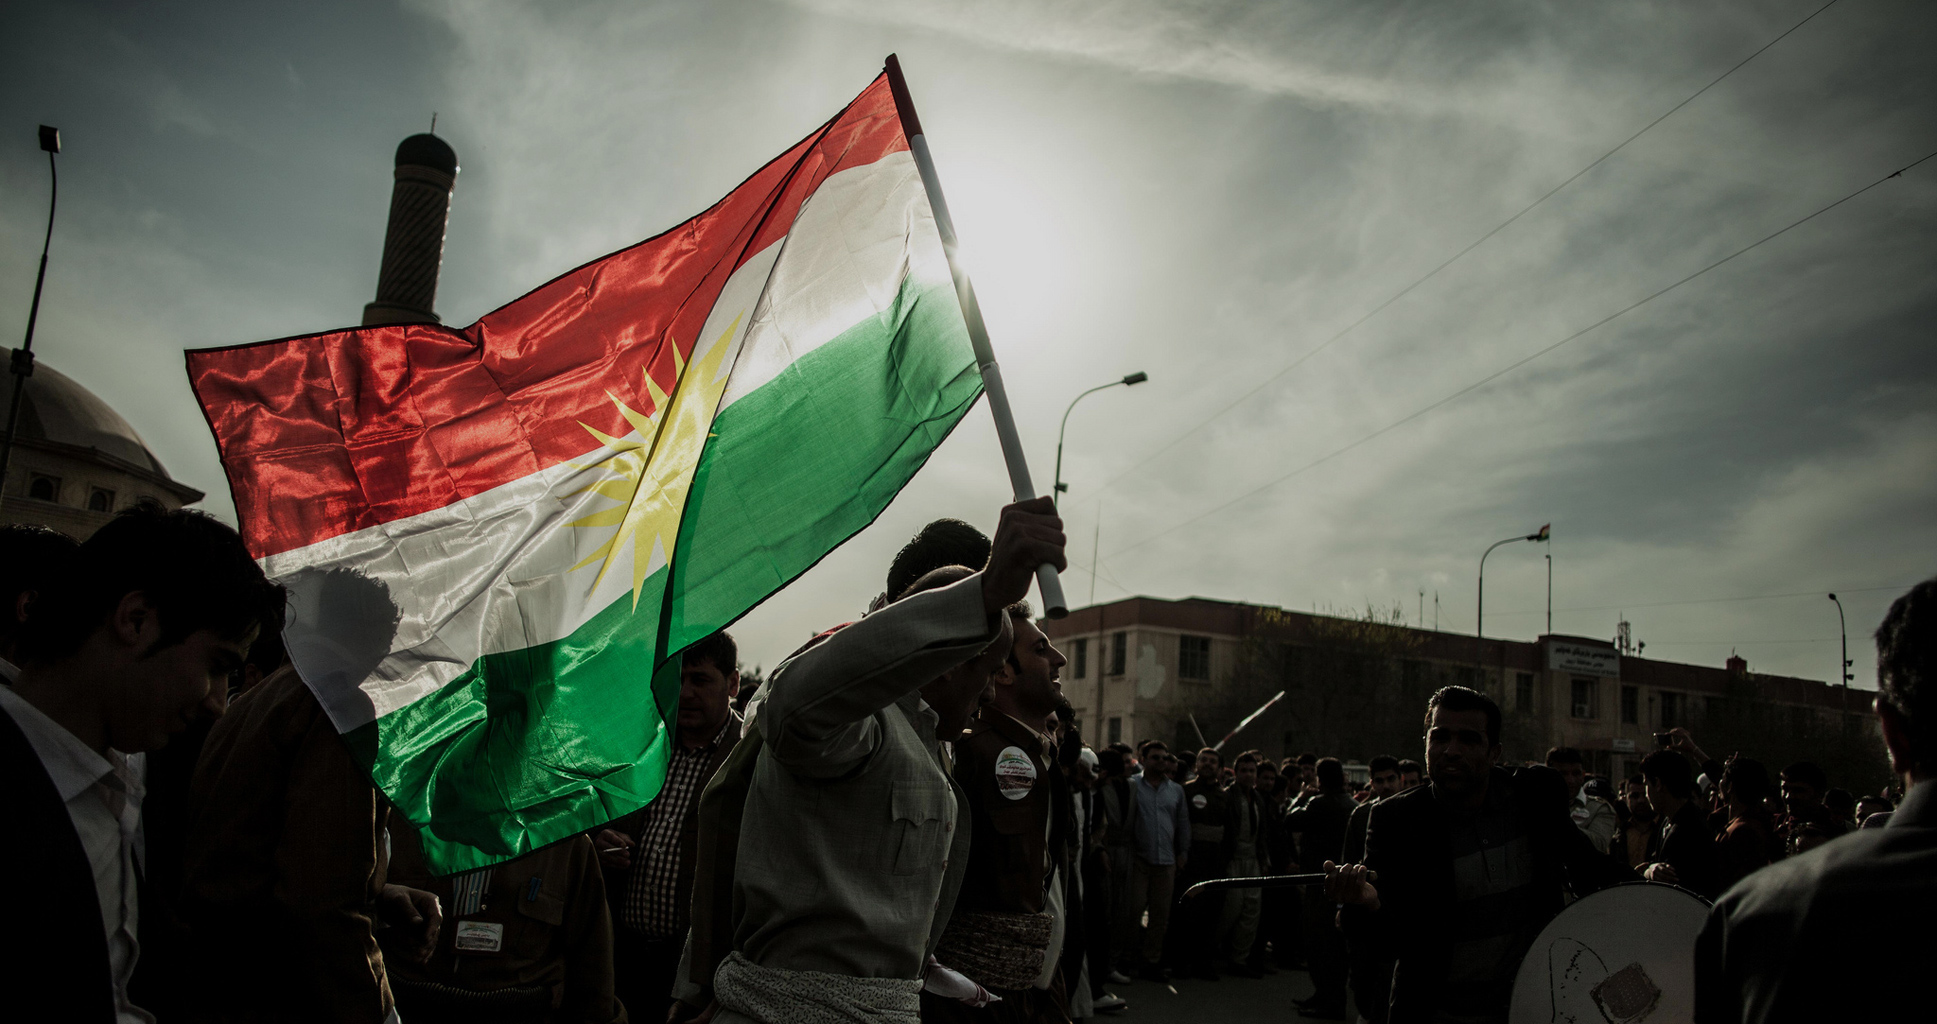 ulyces-kurdishdream-couv01